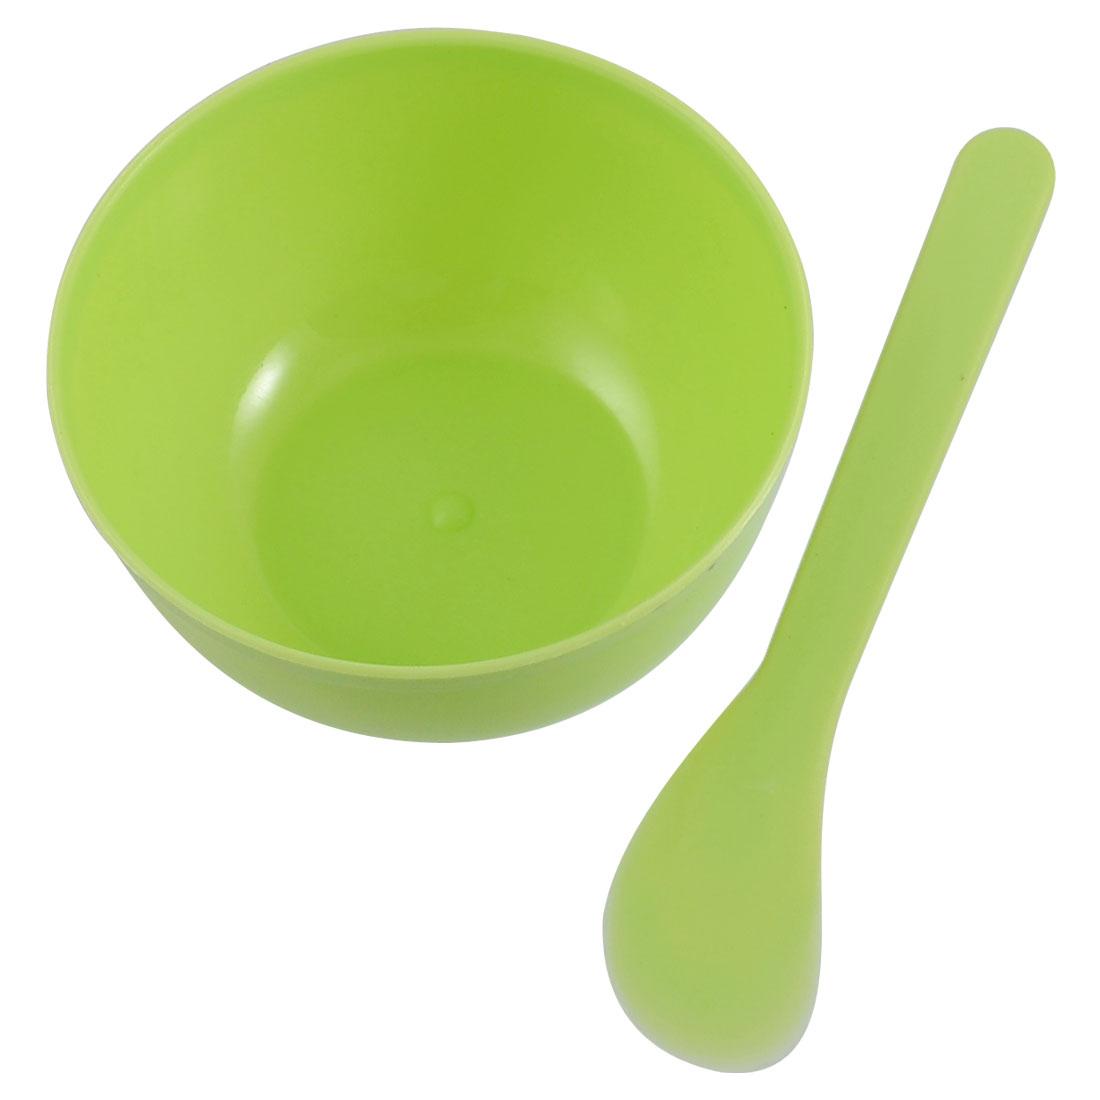 Green Make Up Facial Face Skin Care Plastic Mask Bowl Stick Set